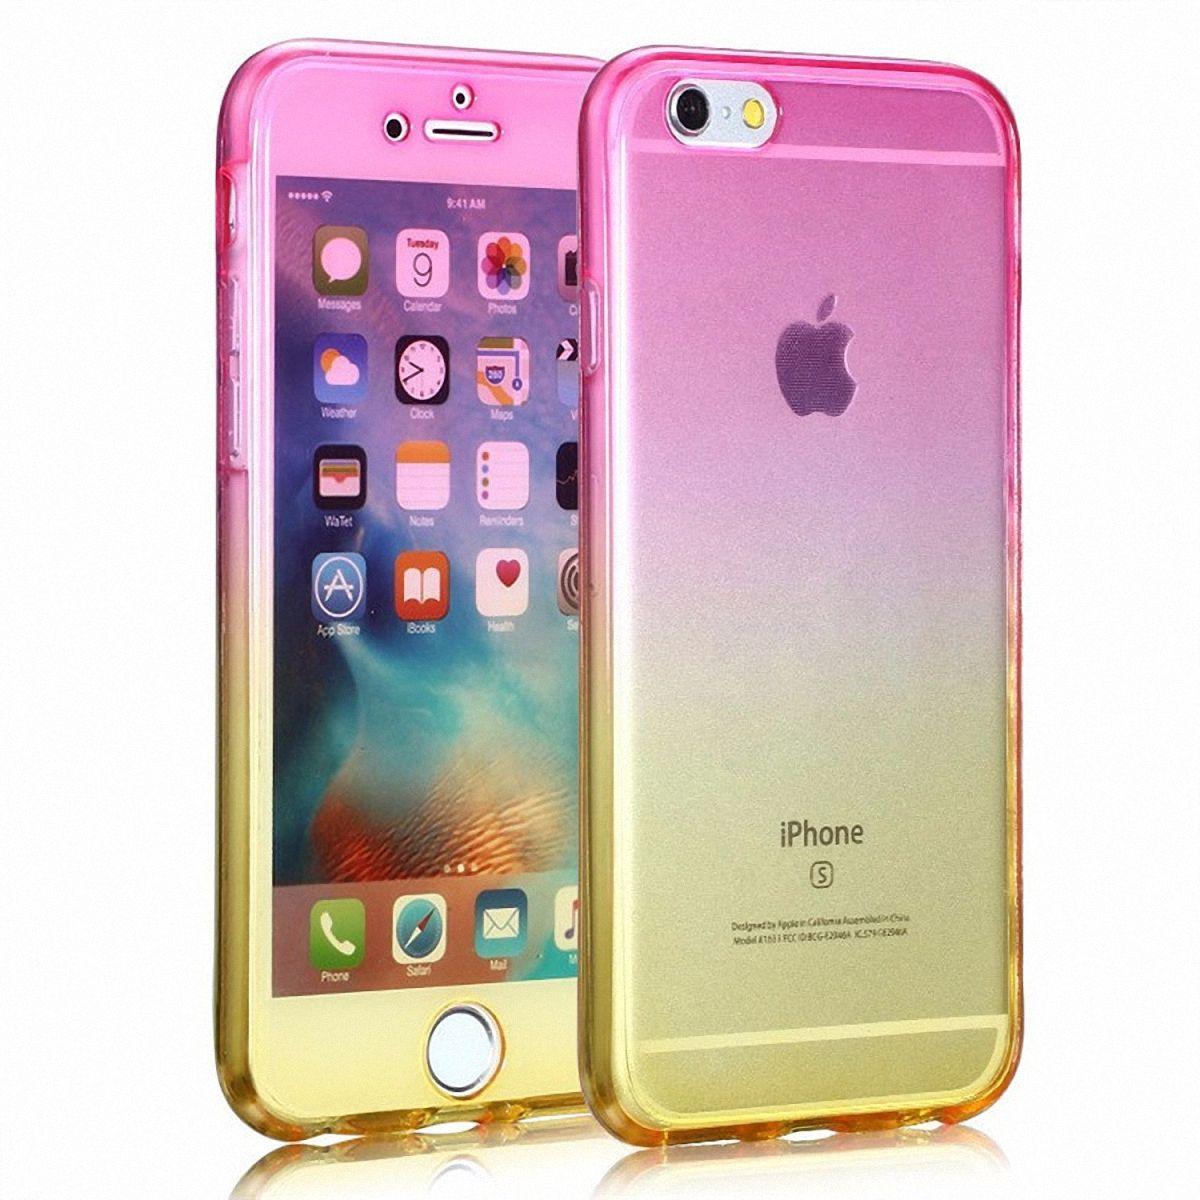 Crystal Case Hülle für Apple iPhone SE 2020 Pink Gelb Rahmen Full Body